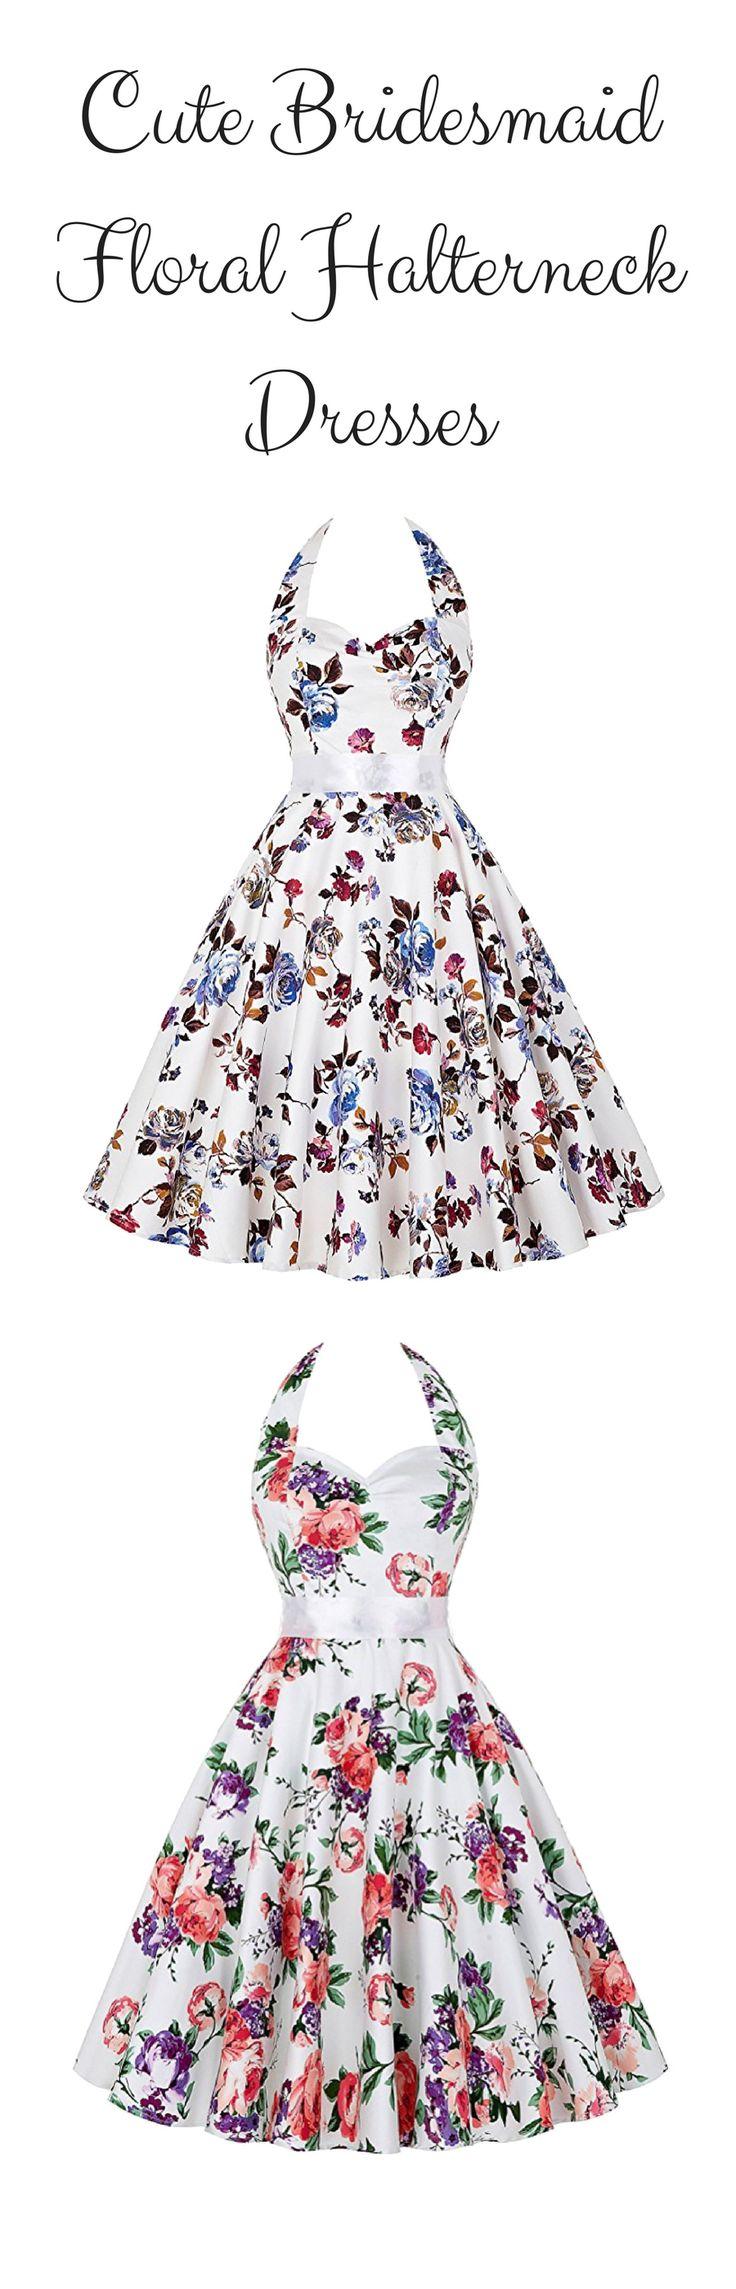 Cute bridesmaid floral halterneck dresses - GRACE KARIN Women's Halter 1950s Vintage Wiggle Dress for Party Cocktail - https://www.amazon.com/GRACE-KARIN-Womens-Vintage-Cocktail/dp/B00X53D0TC/ref=as_li_ss_tl?_encoding=UTF8&refRID=MS2F8RXR5EK8KA7W9W8A&linkCode=ll1&tag=theweddingclu-20&linkId=d40fb5d2266b91cf2e24ba0aa02e4bbd